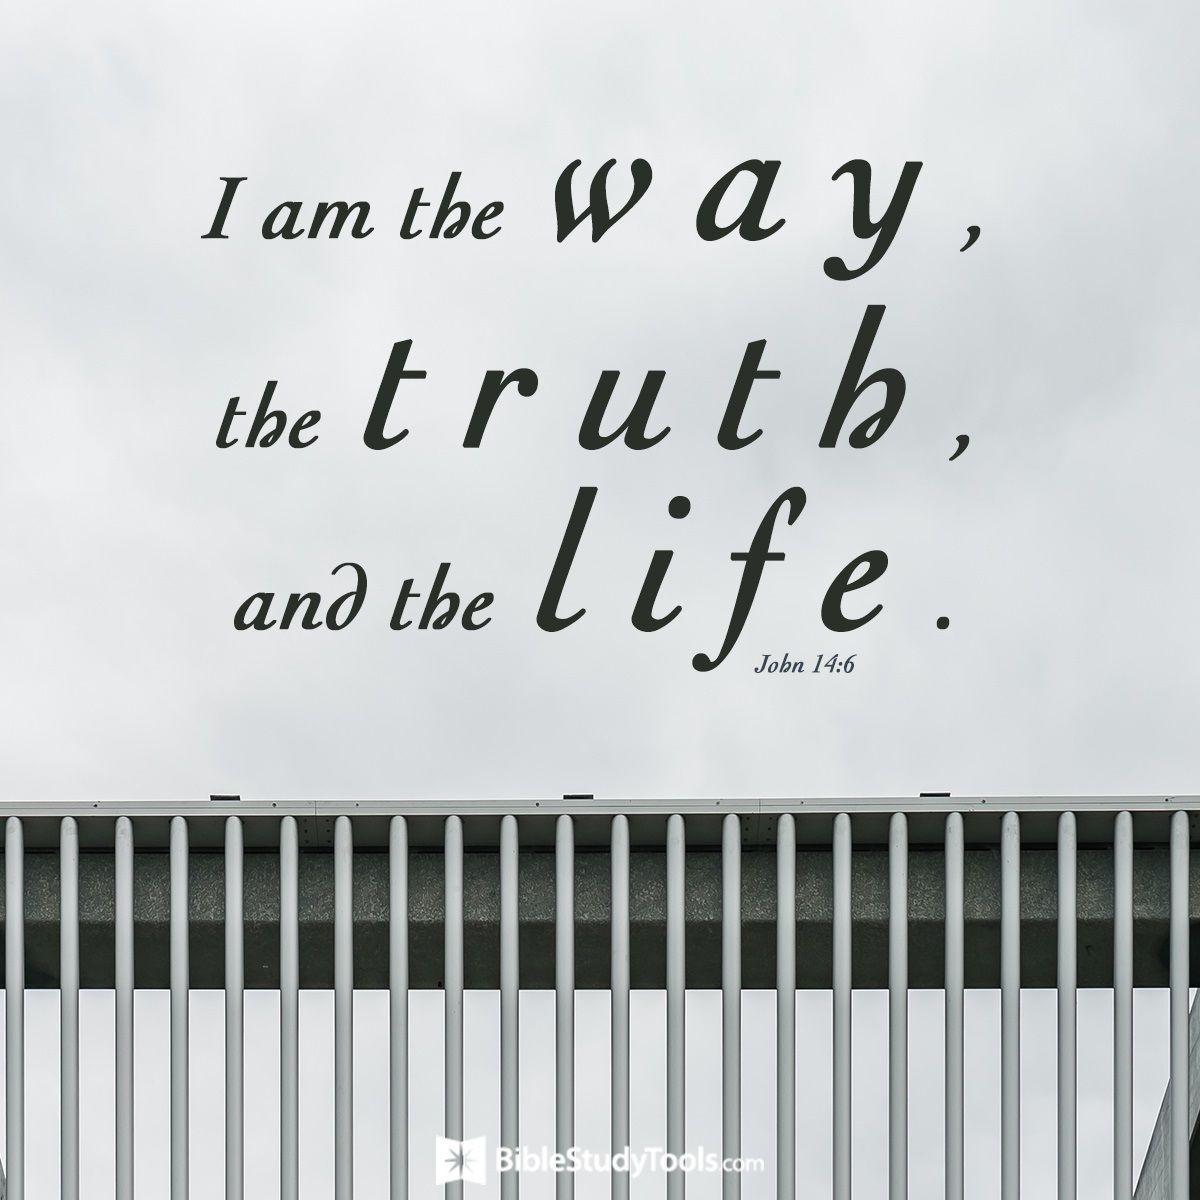 Your Daily Verse - John 14:6